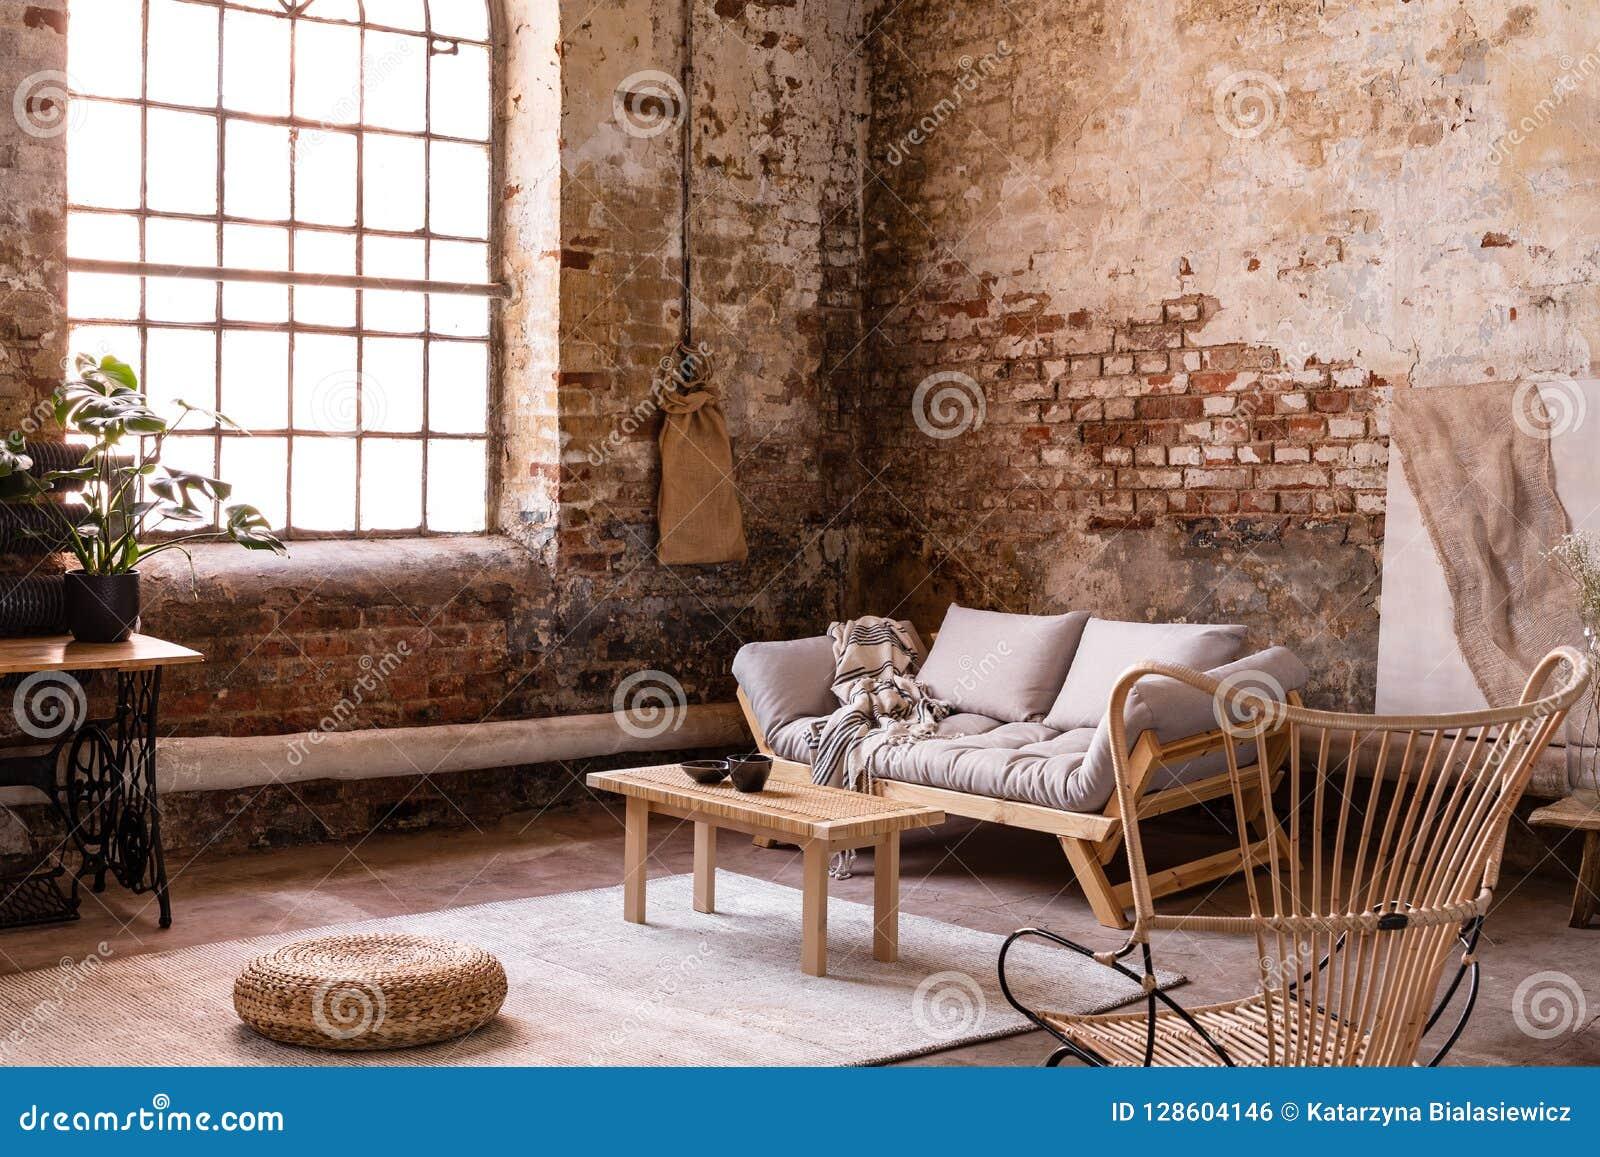 Pouf and wooden table on carpet near window in wabi sabi interior with sofa and armchair stock - Wabi sabi interior design ...